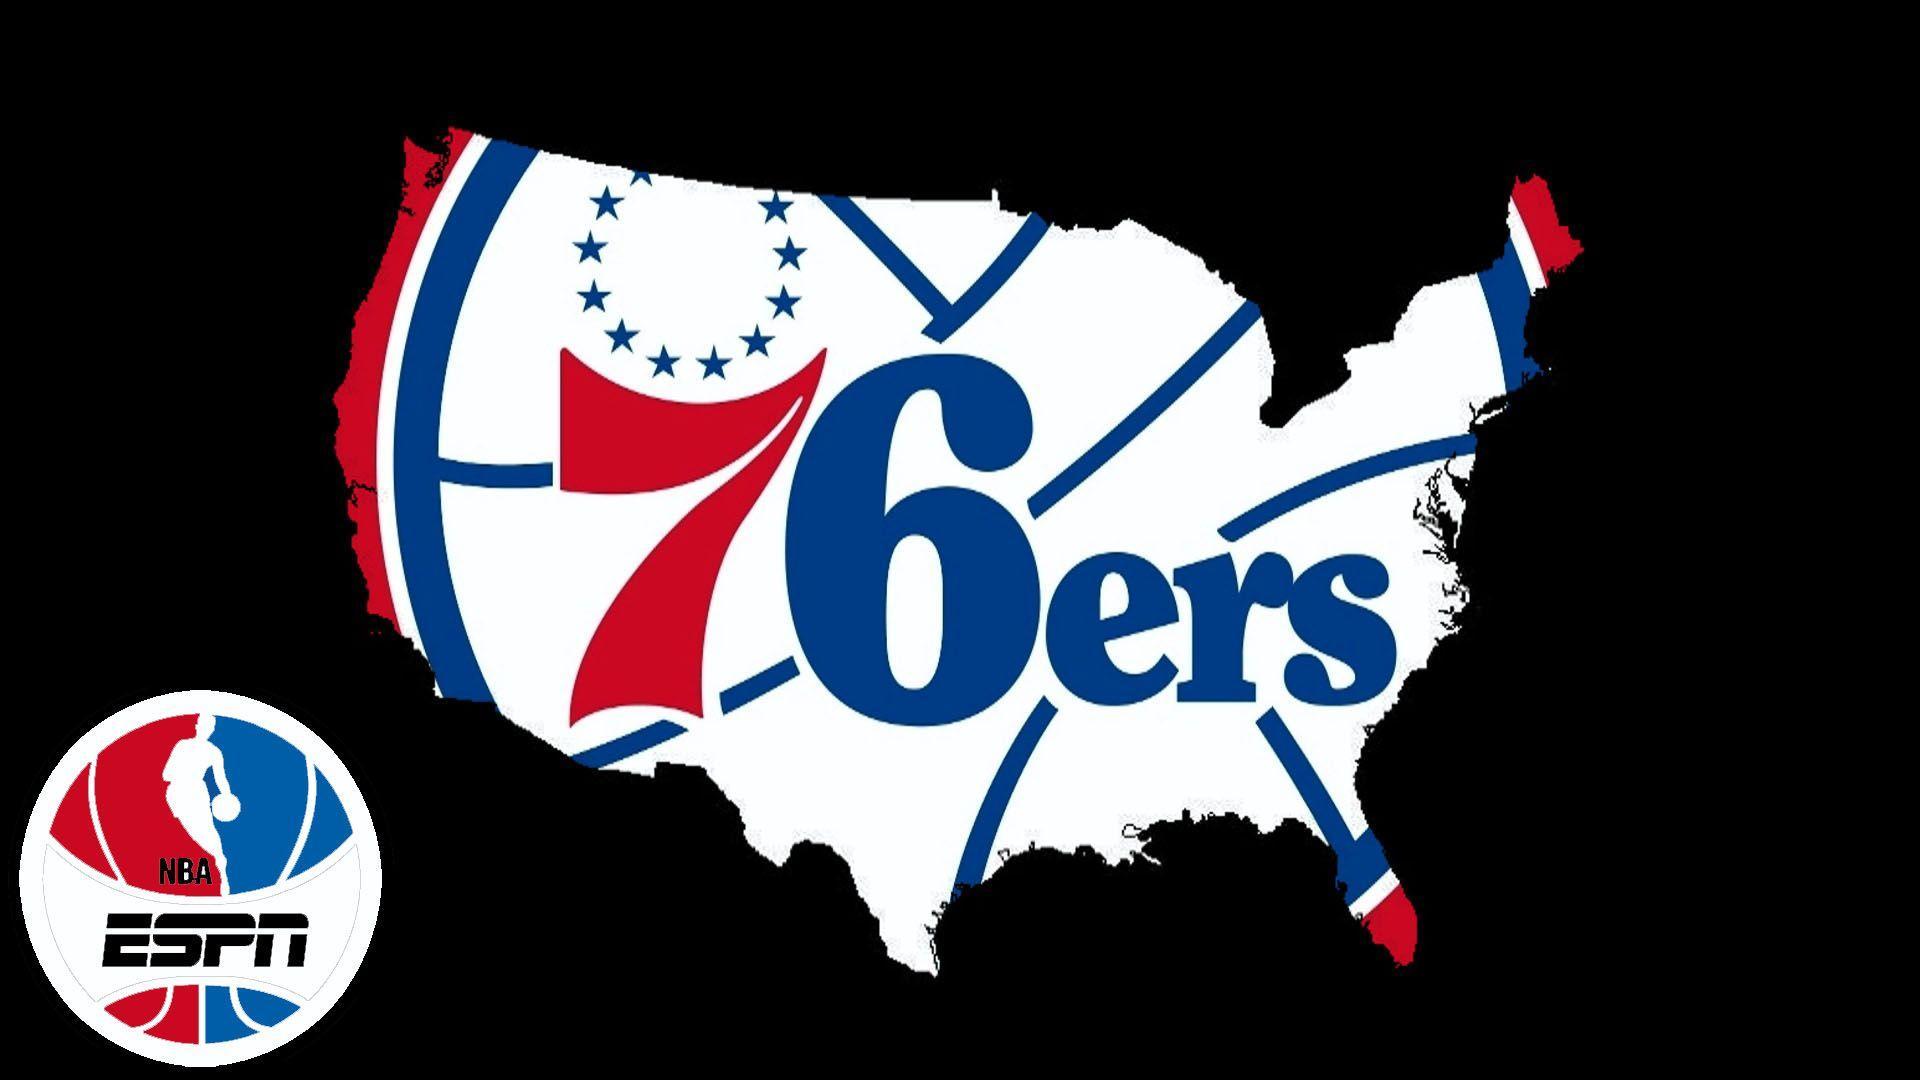 76ers - photo #12